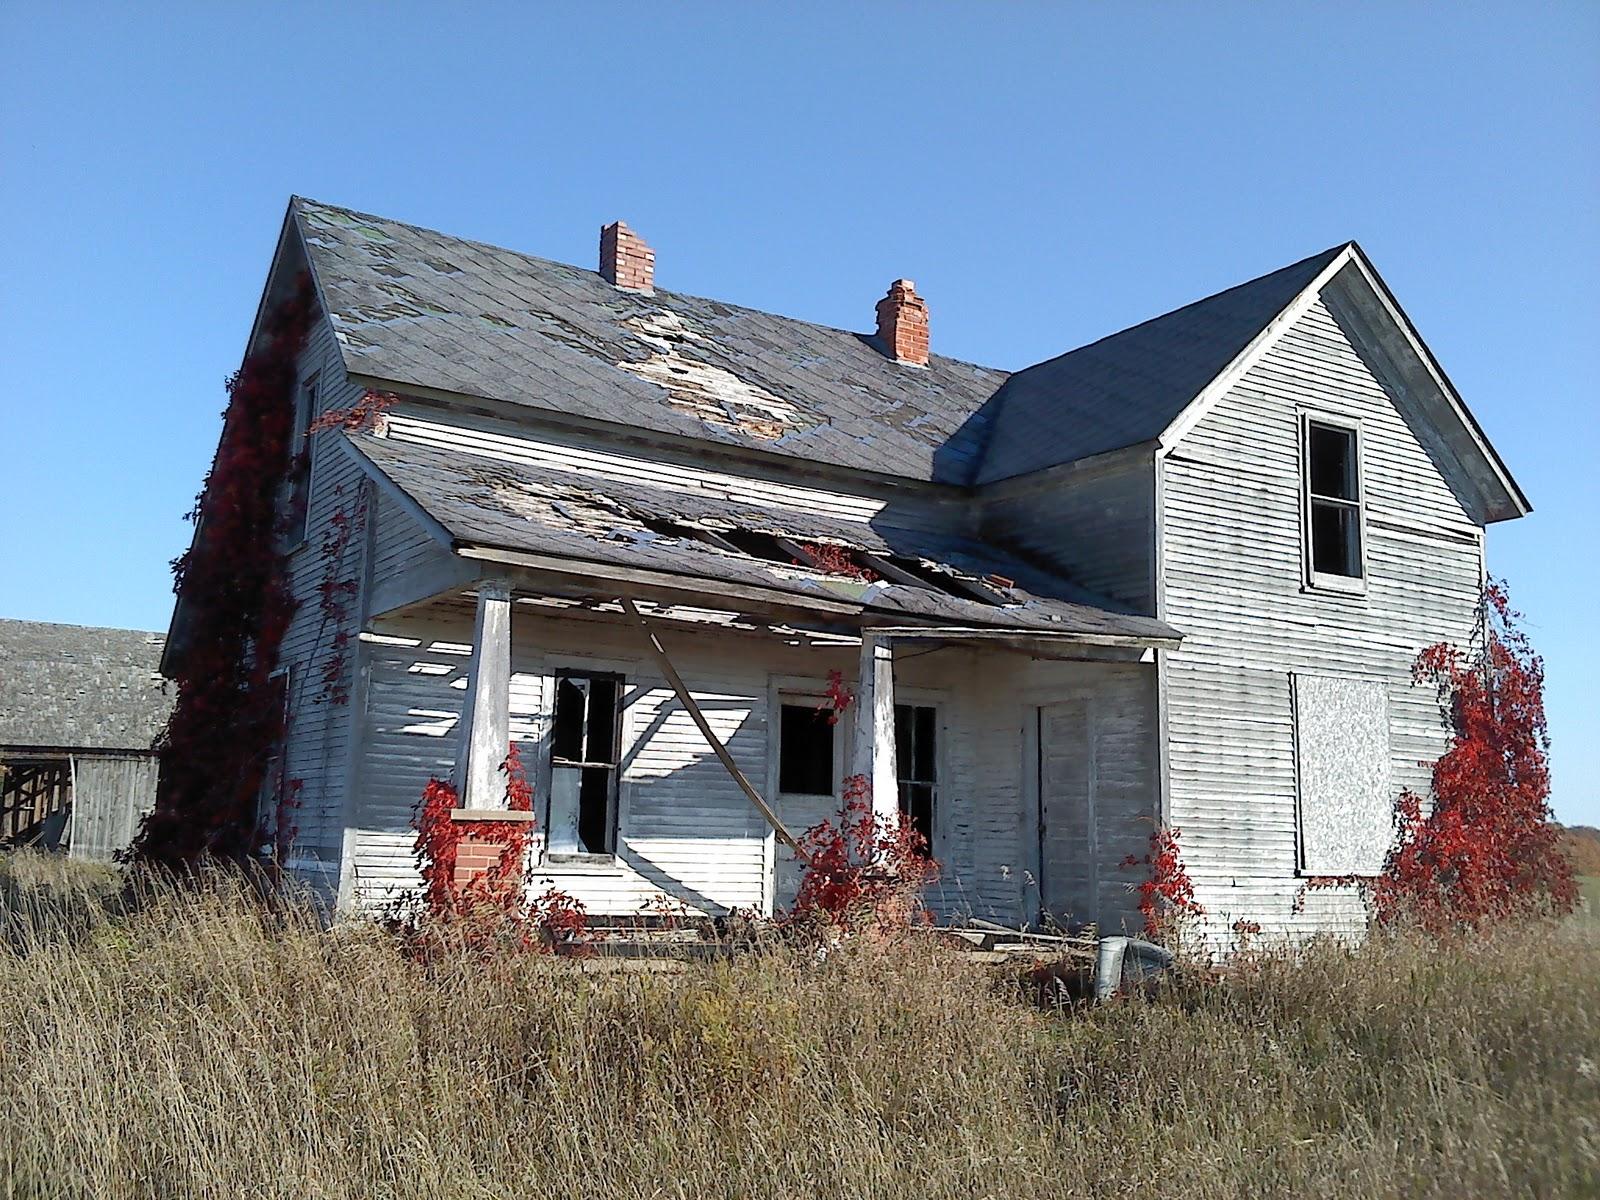 Fall, Old Abandon Farm Houses, Petoskey, Steve Jobs And My Birthday